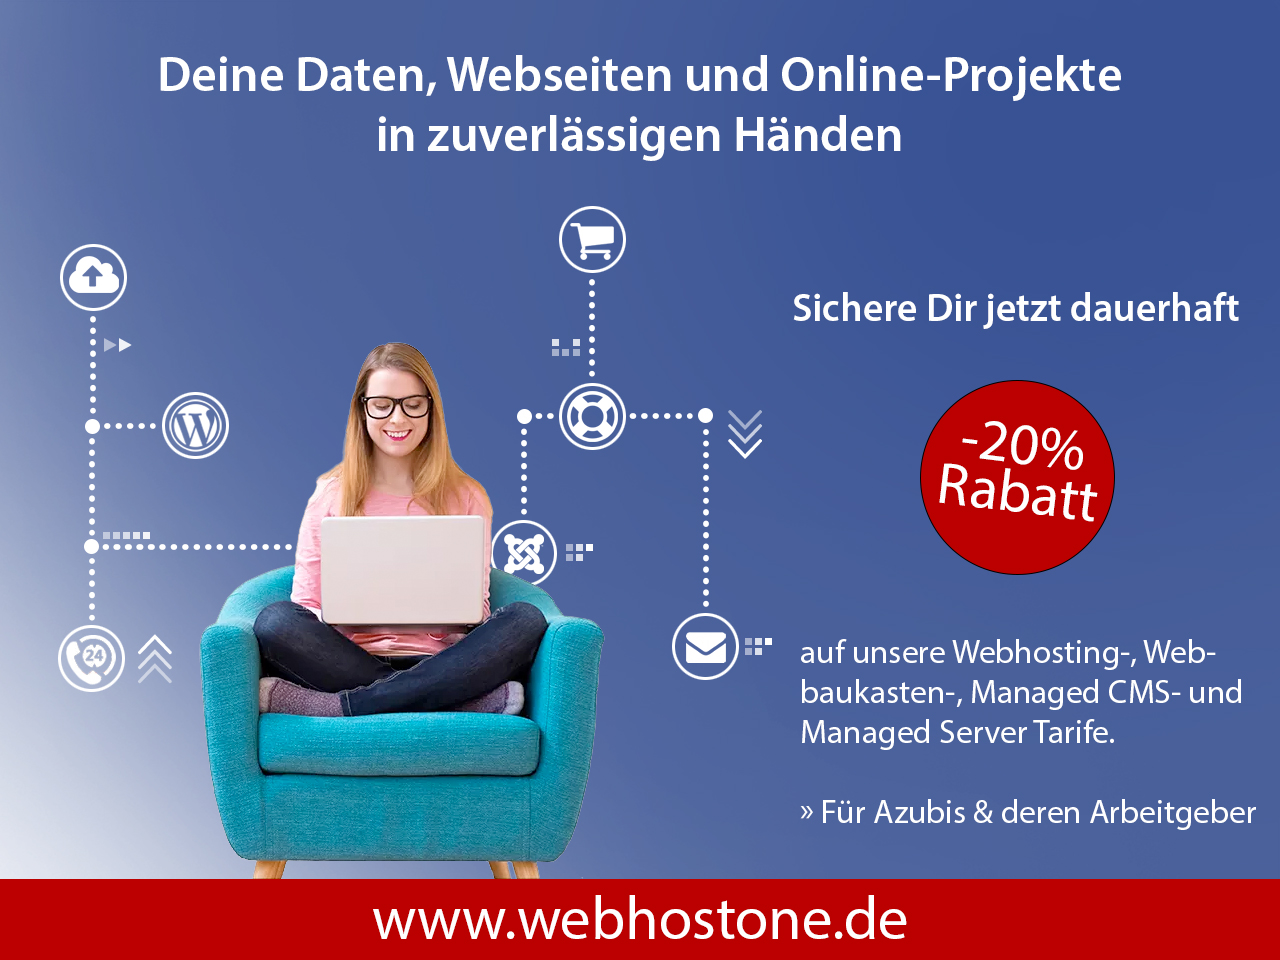 WebhostOne GmbH - 20% Rabatt auf Webhosting Tarife und Managed Server